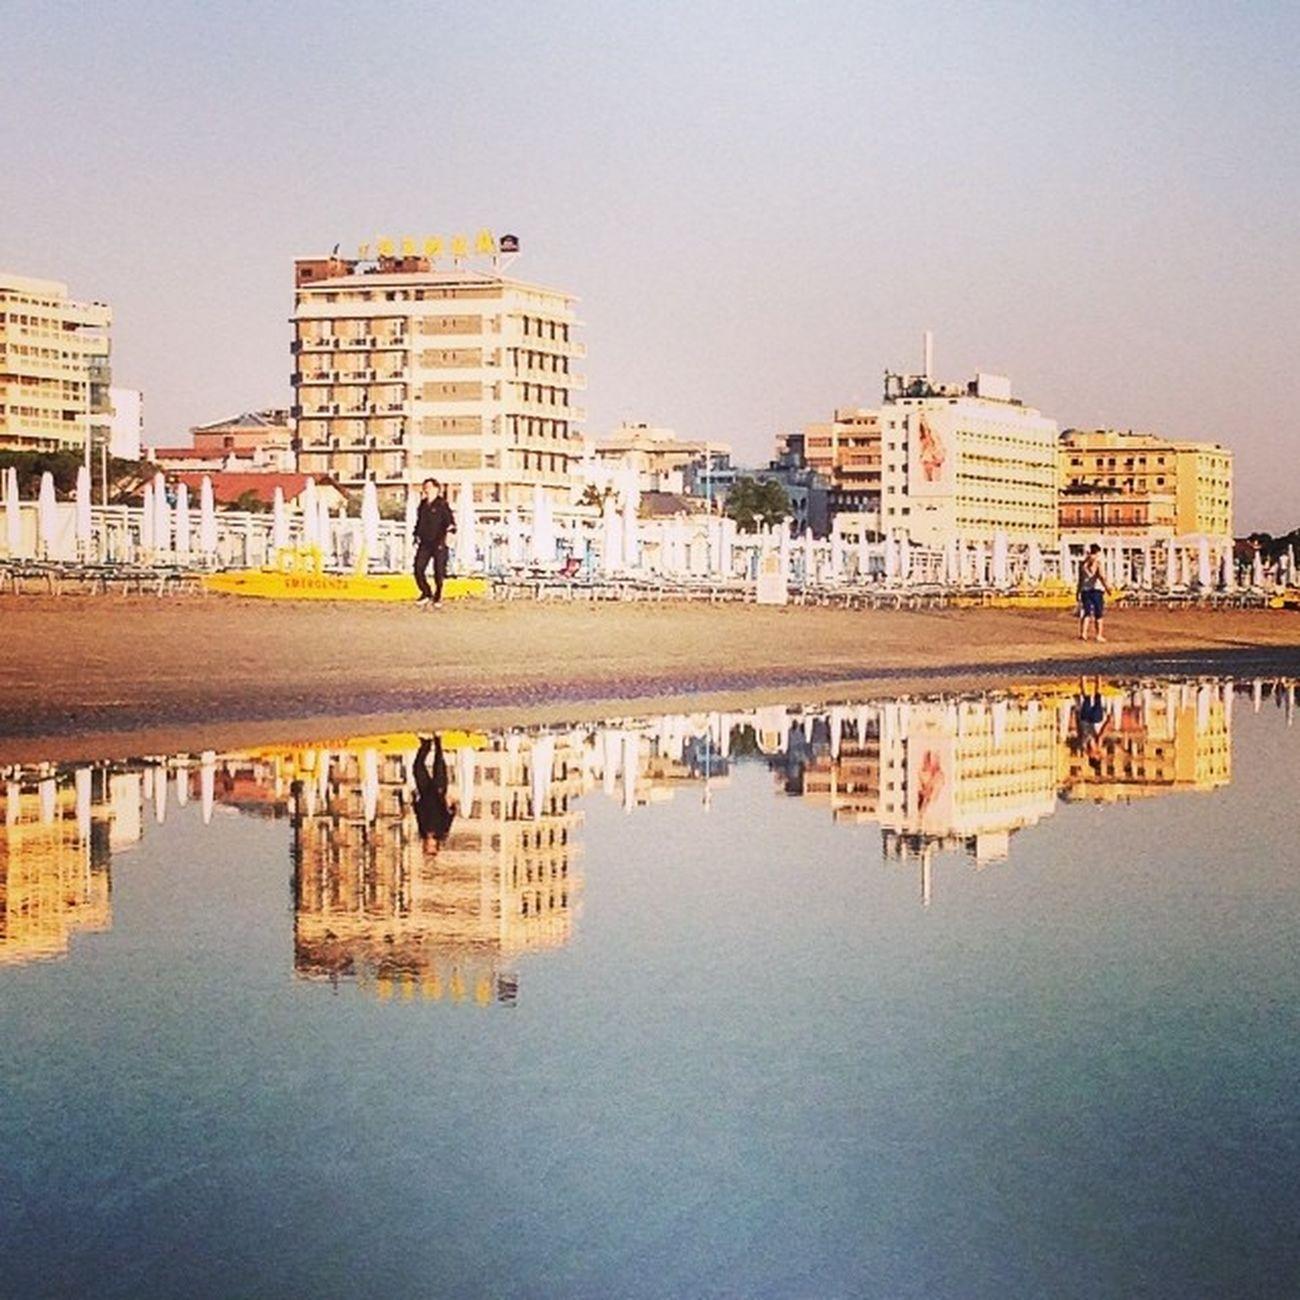 Summer Beach Italy Alba Riccione Lifeisbeautiful Webstapick LifeLessOrdinary Meshpics